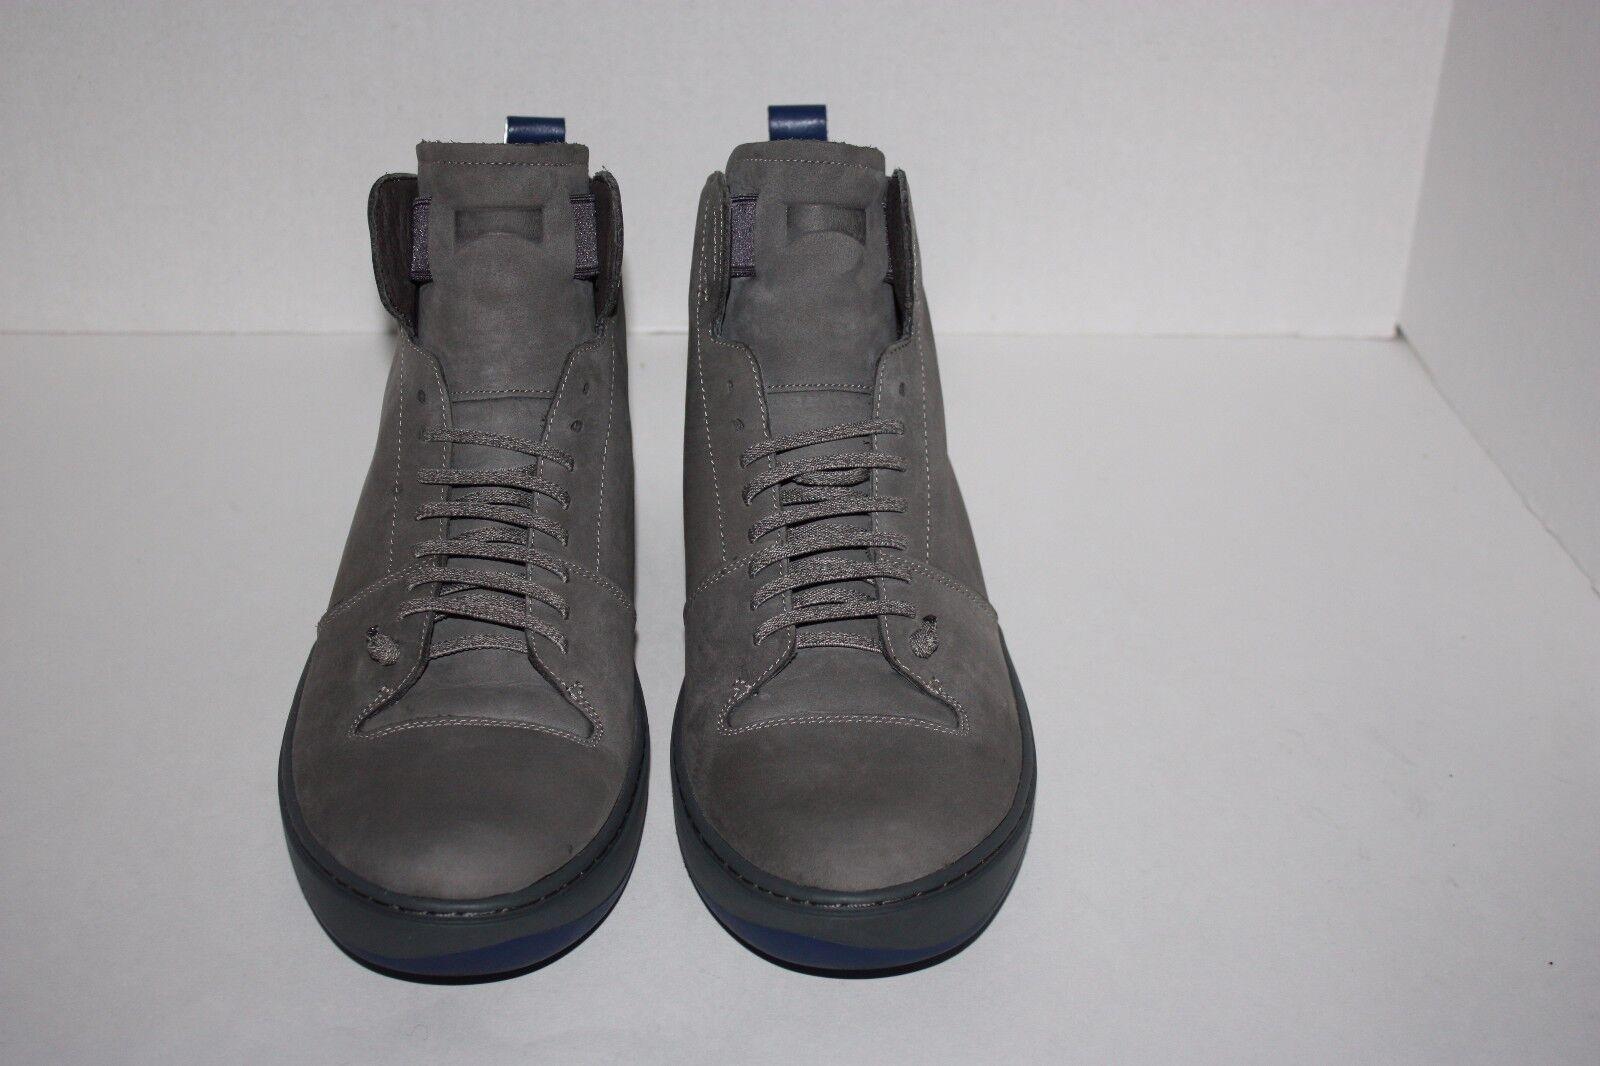 460f213785d8 ... Mens CAMPER CAMPER CAMPER Domus Gray Leather Ankle Boots Size 43   US  10 6e8473 ...